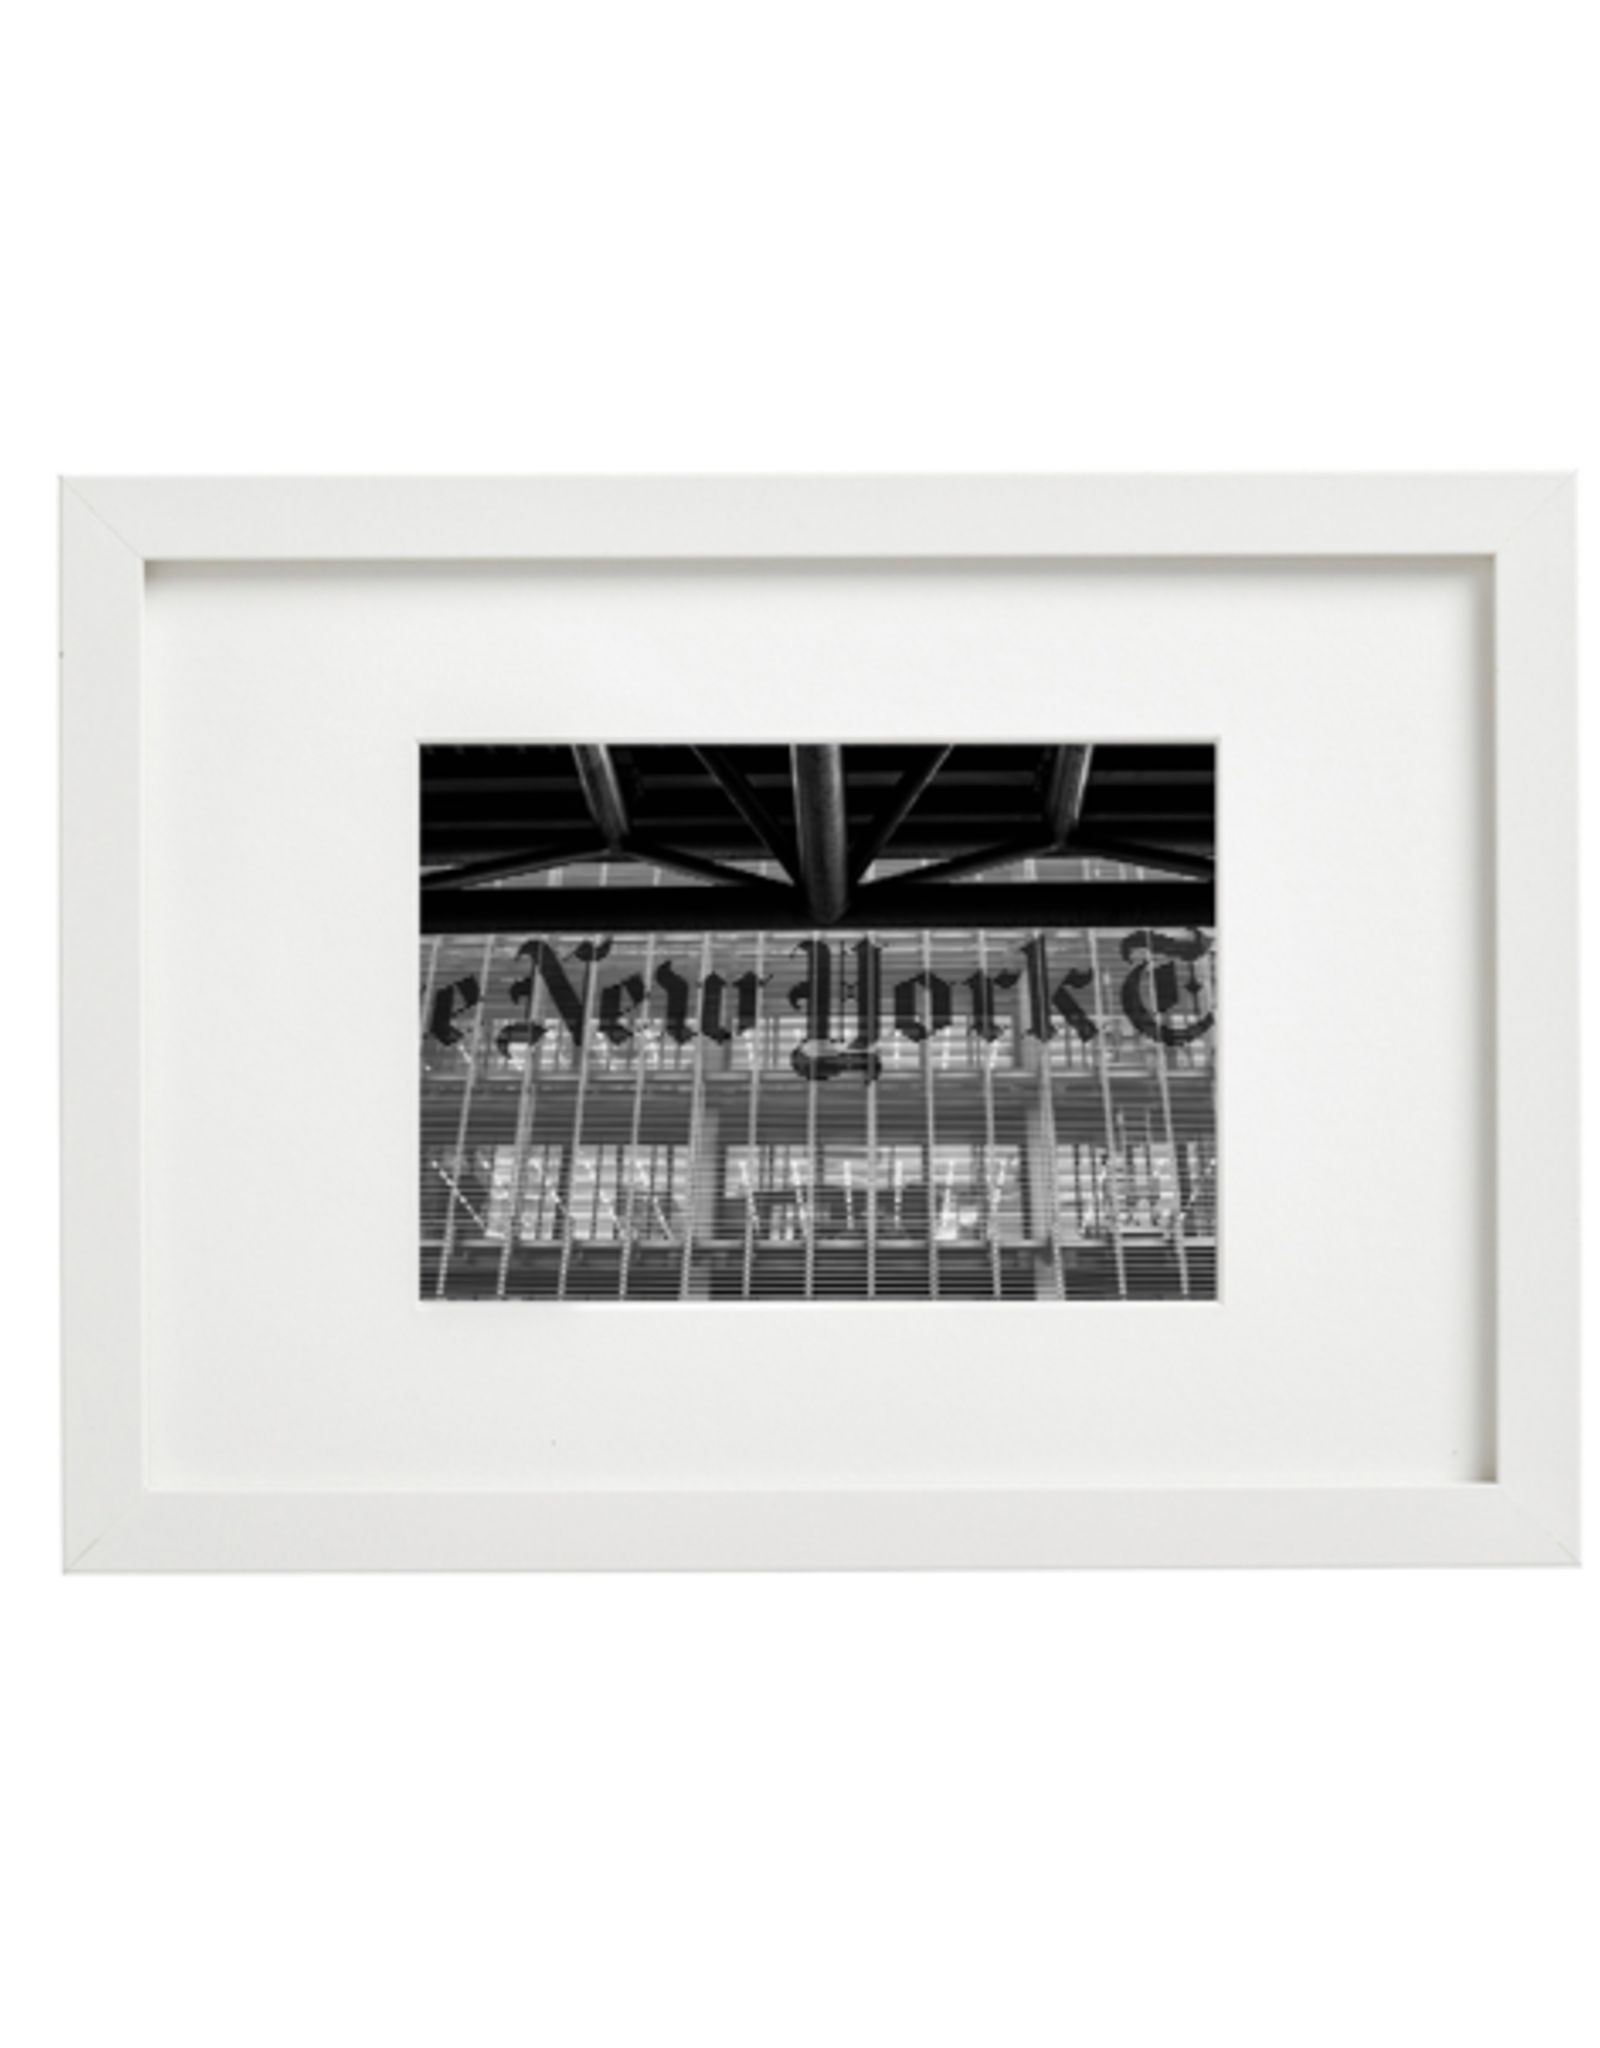 "Aleyah Solomon - Photo Print / New York Times, 8 x 10"""